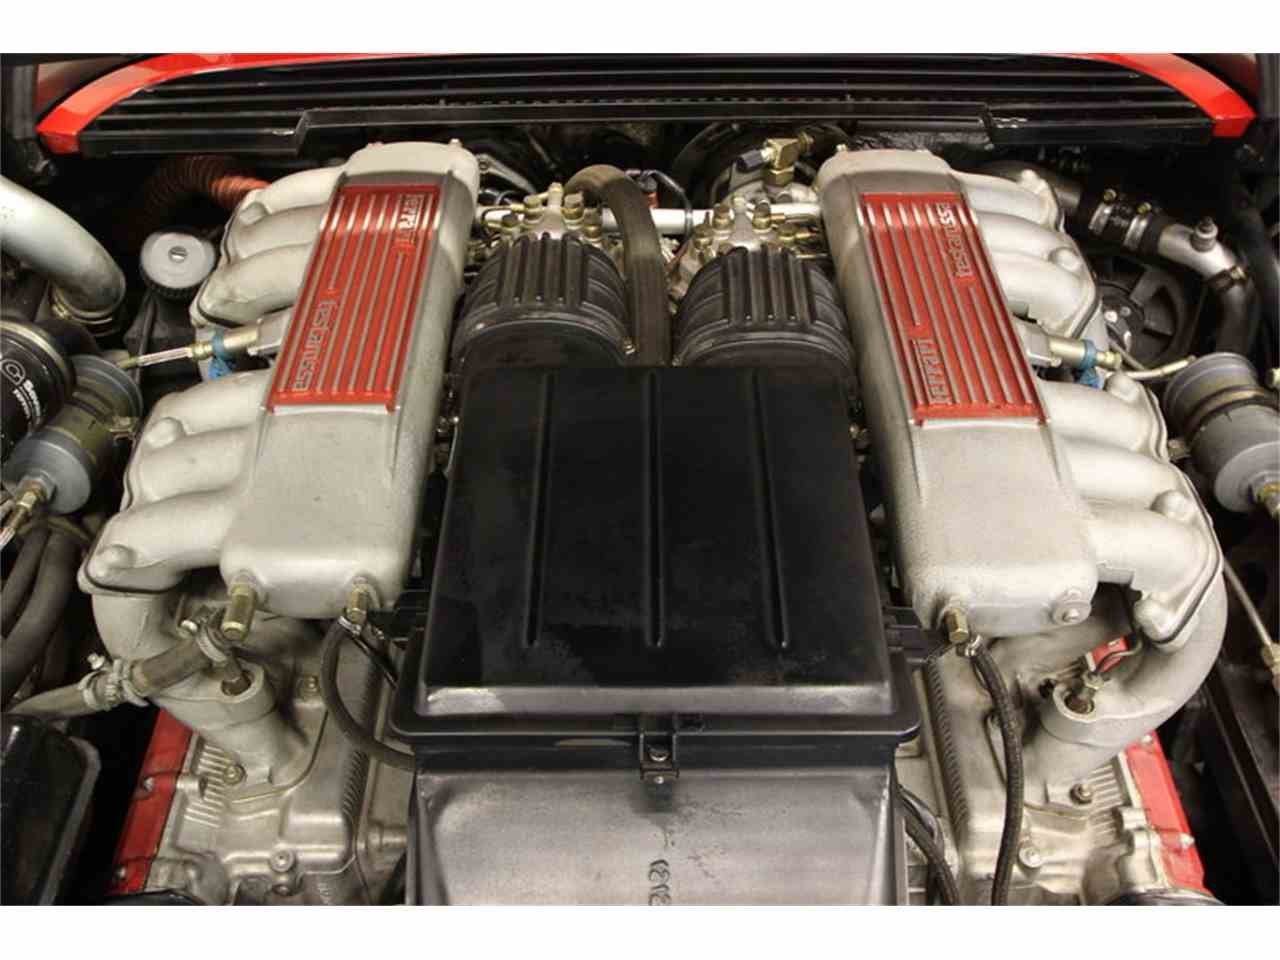 Large Picture of '86 Ferrari Testarossa - $159,995.00 - FNNC